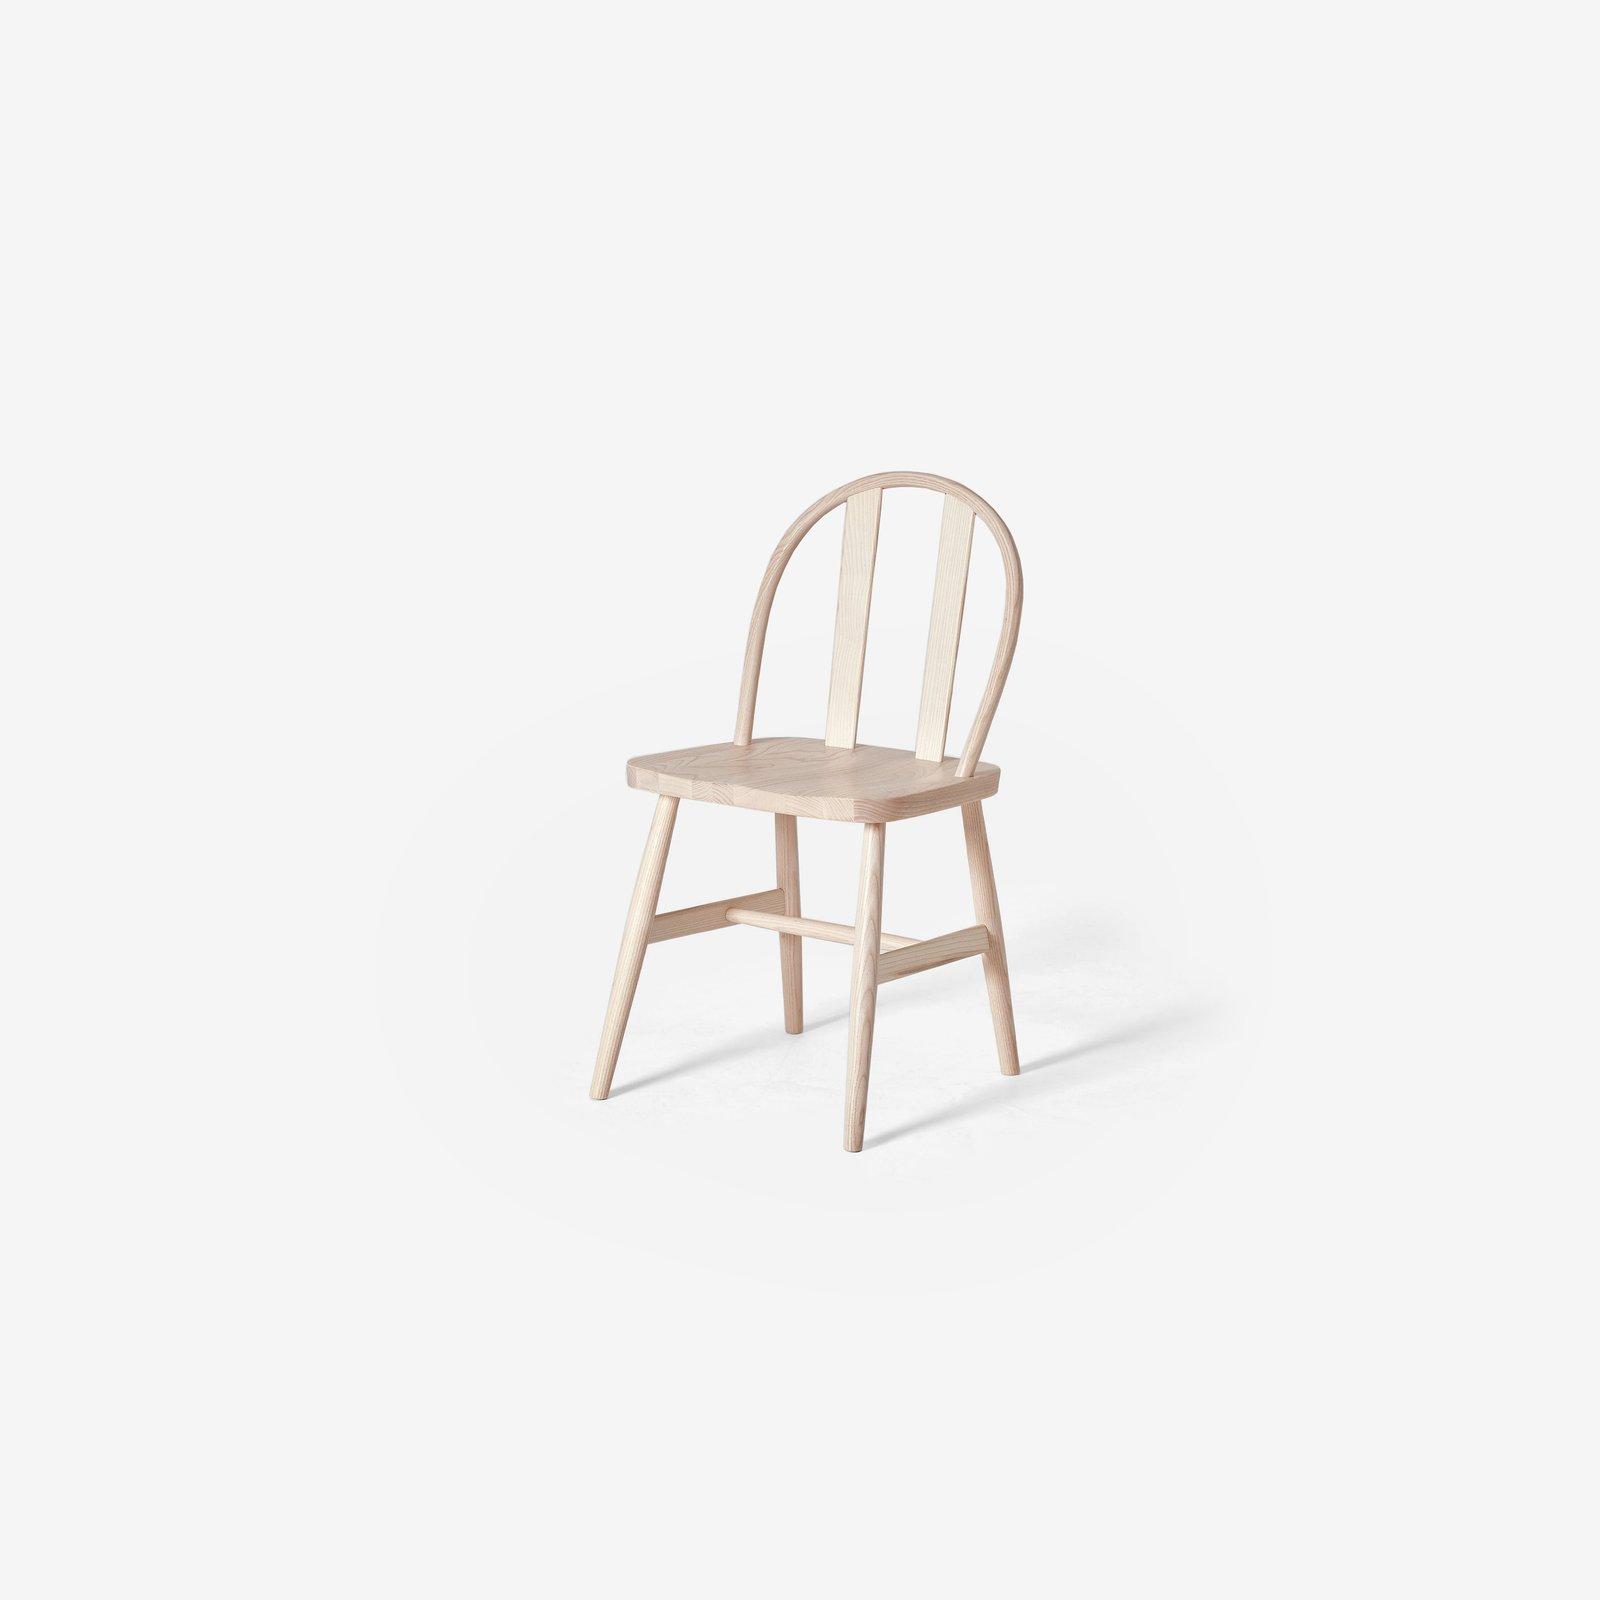 Bird Chair by Leibal Dwell